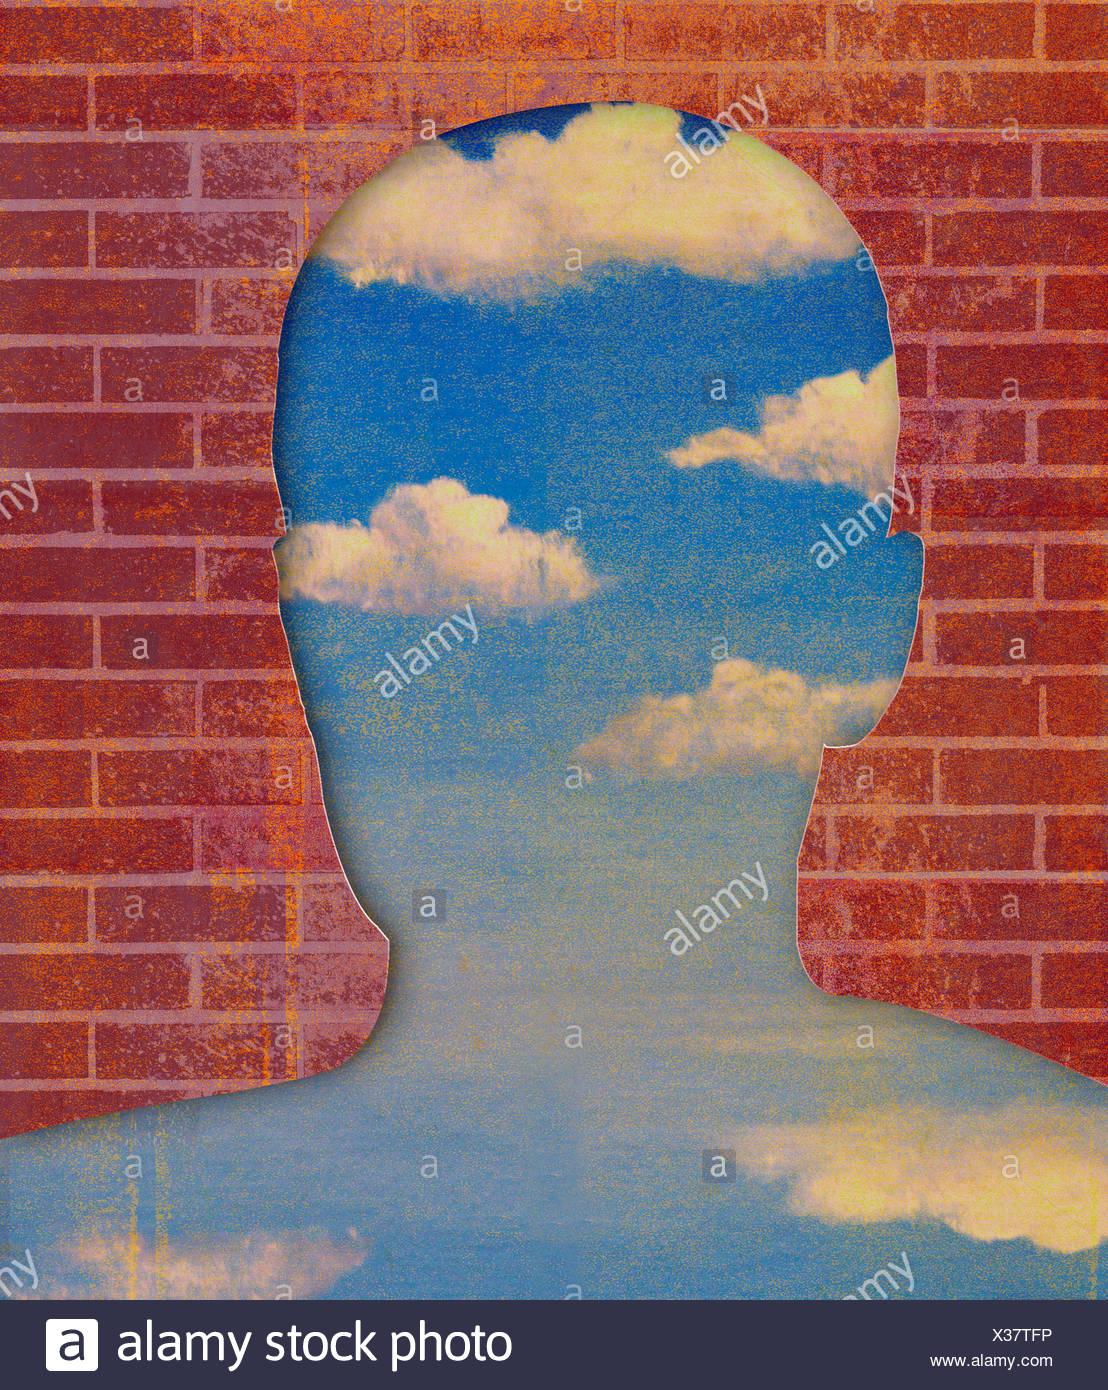 Brick wall revealing blue sky in shape of head - Stock Image